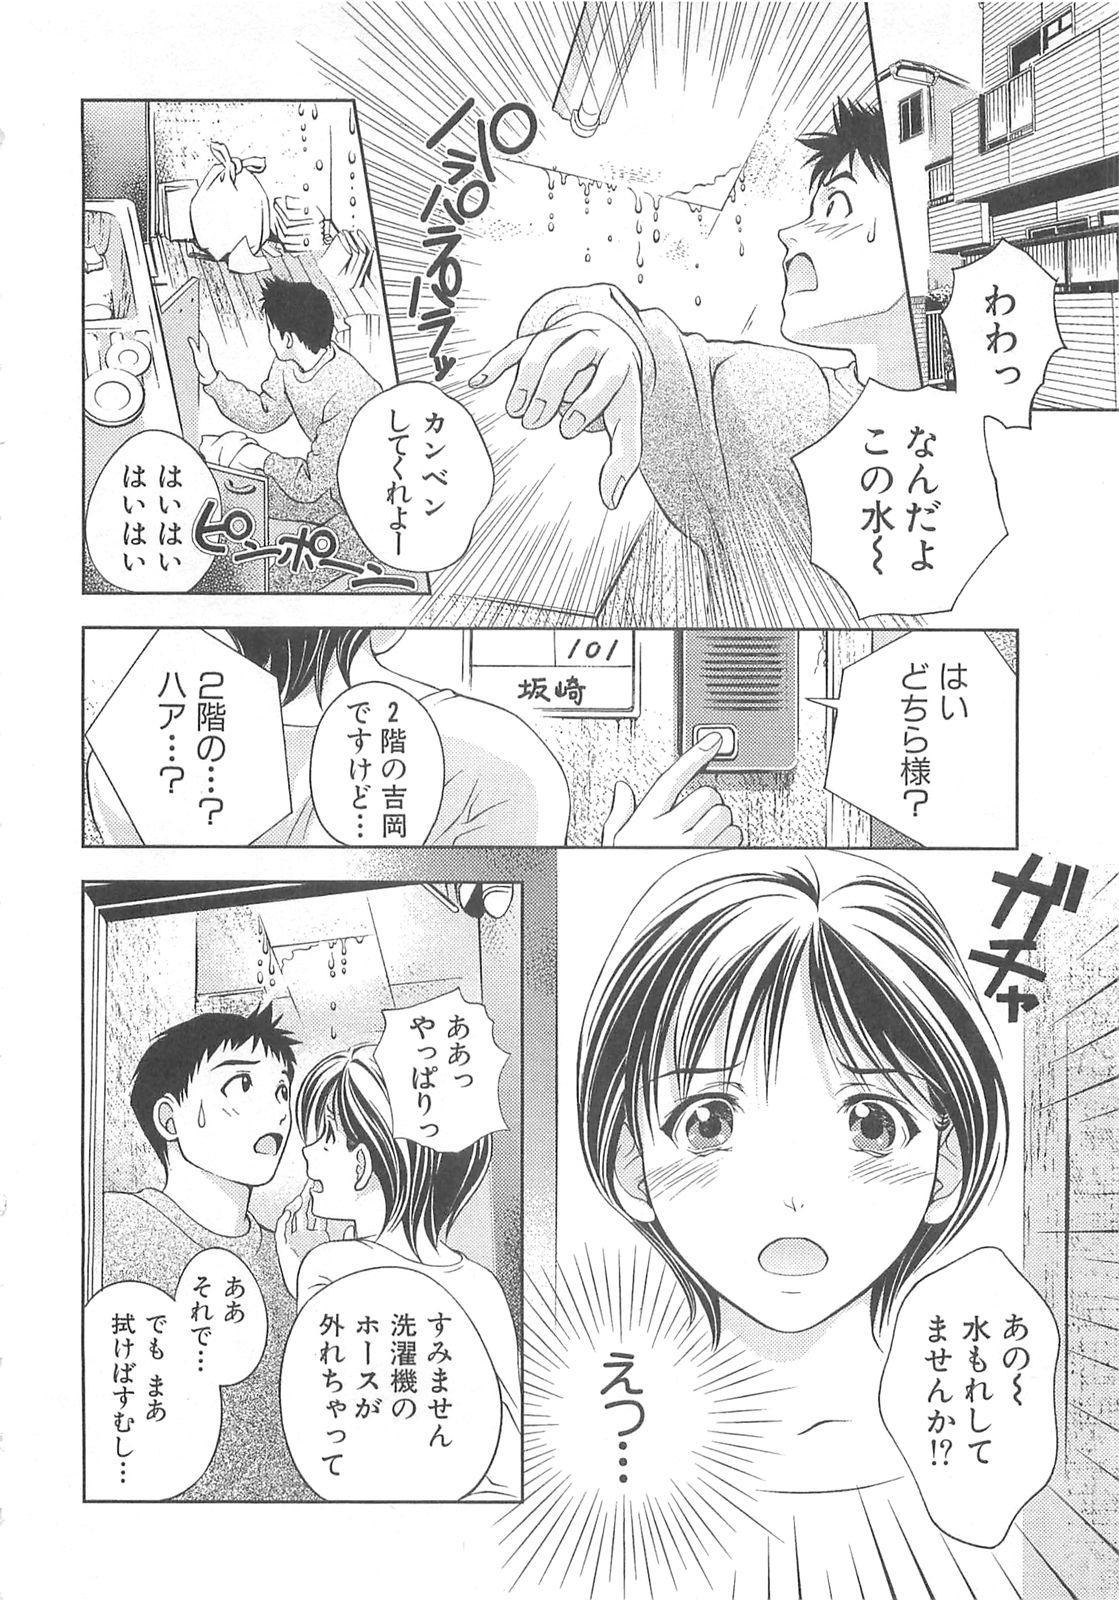 Tenshi no Kyuu - Angel's Pretty Hip 28